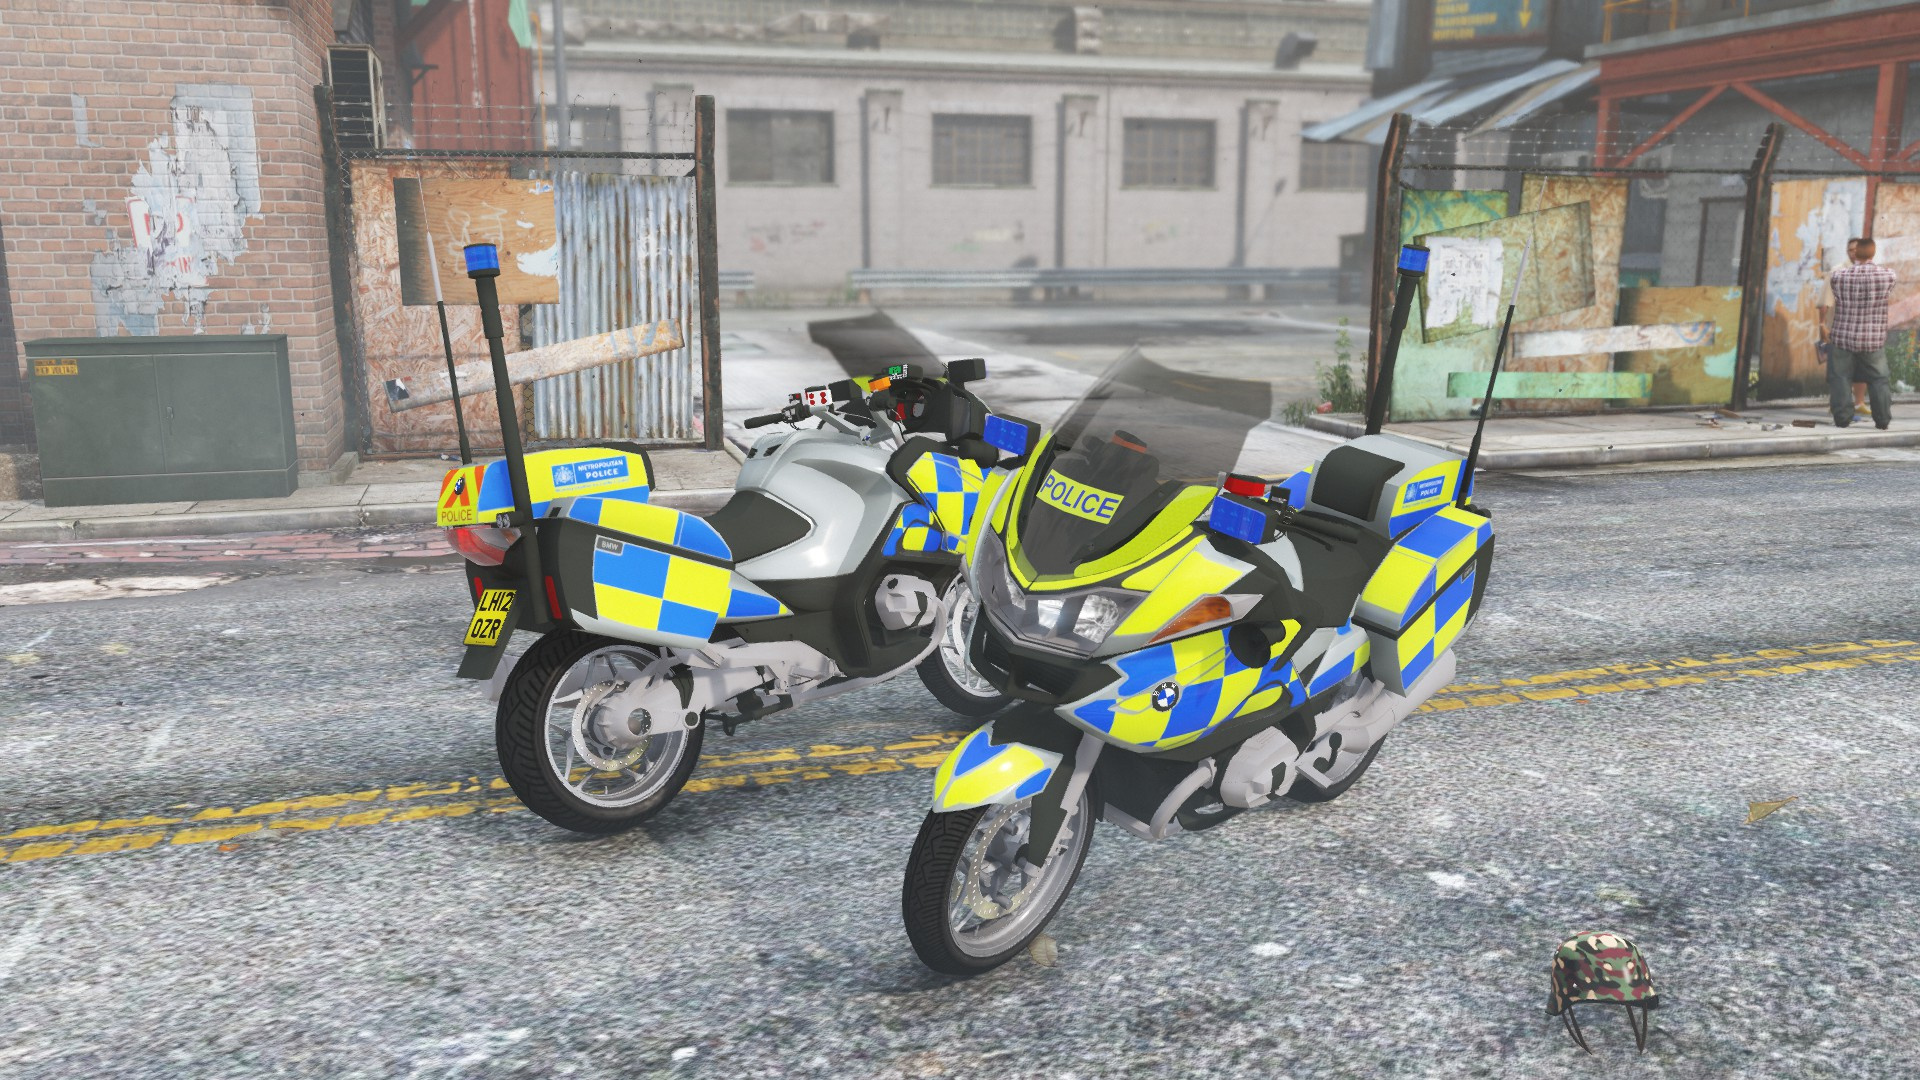 Metropolitan Police Bmw R1200rt Gta5 Mods Com